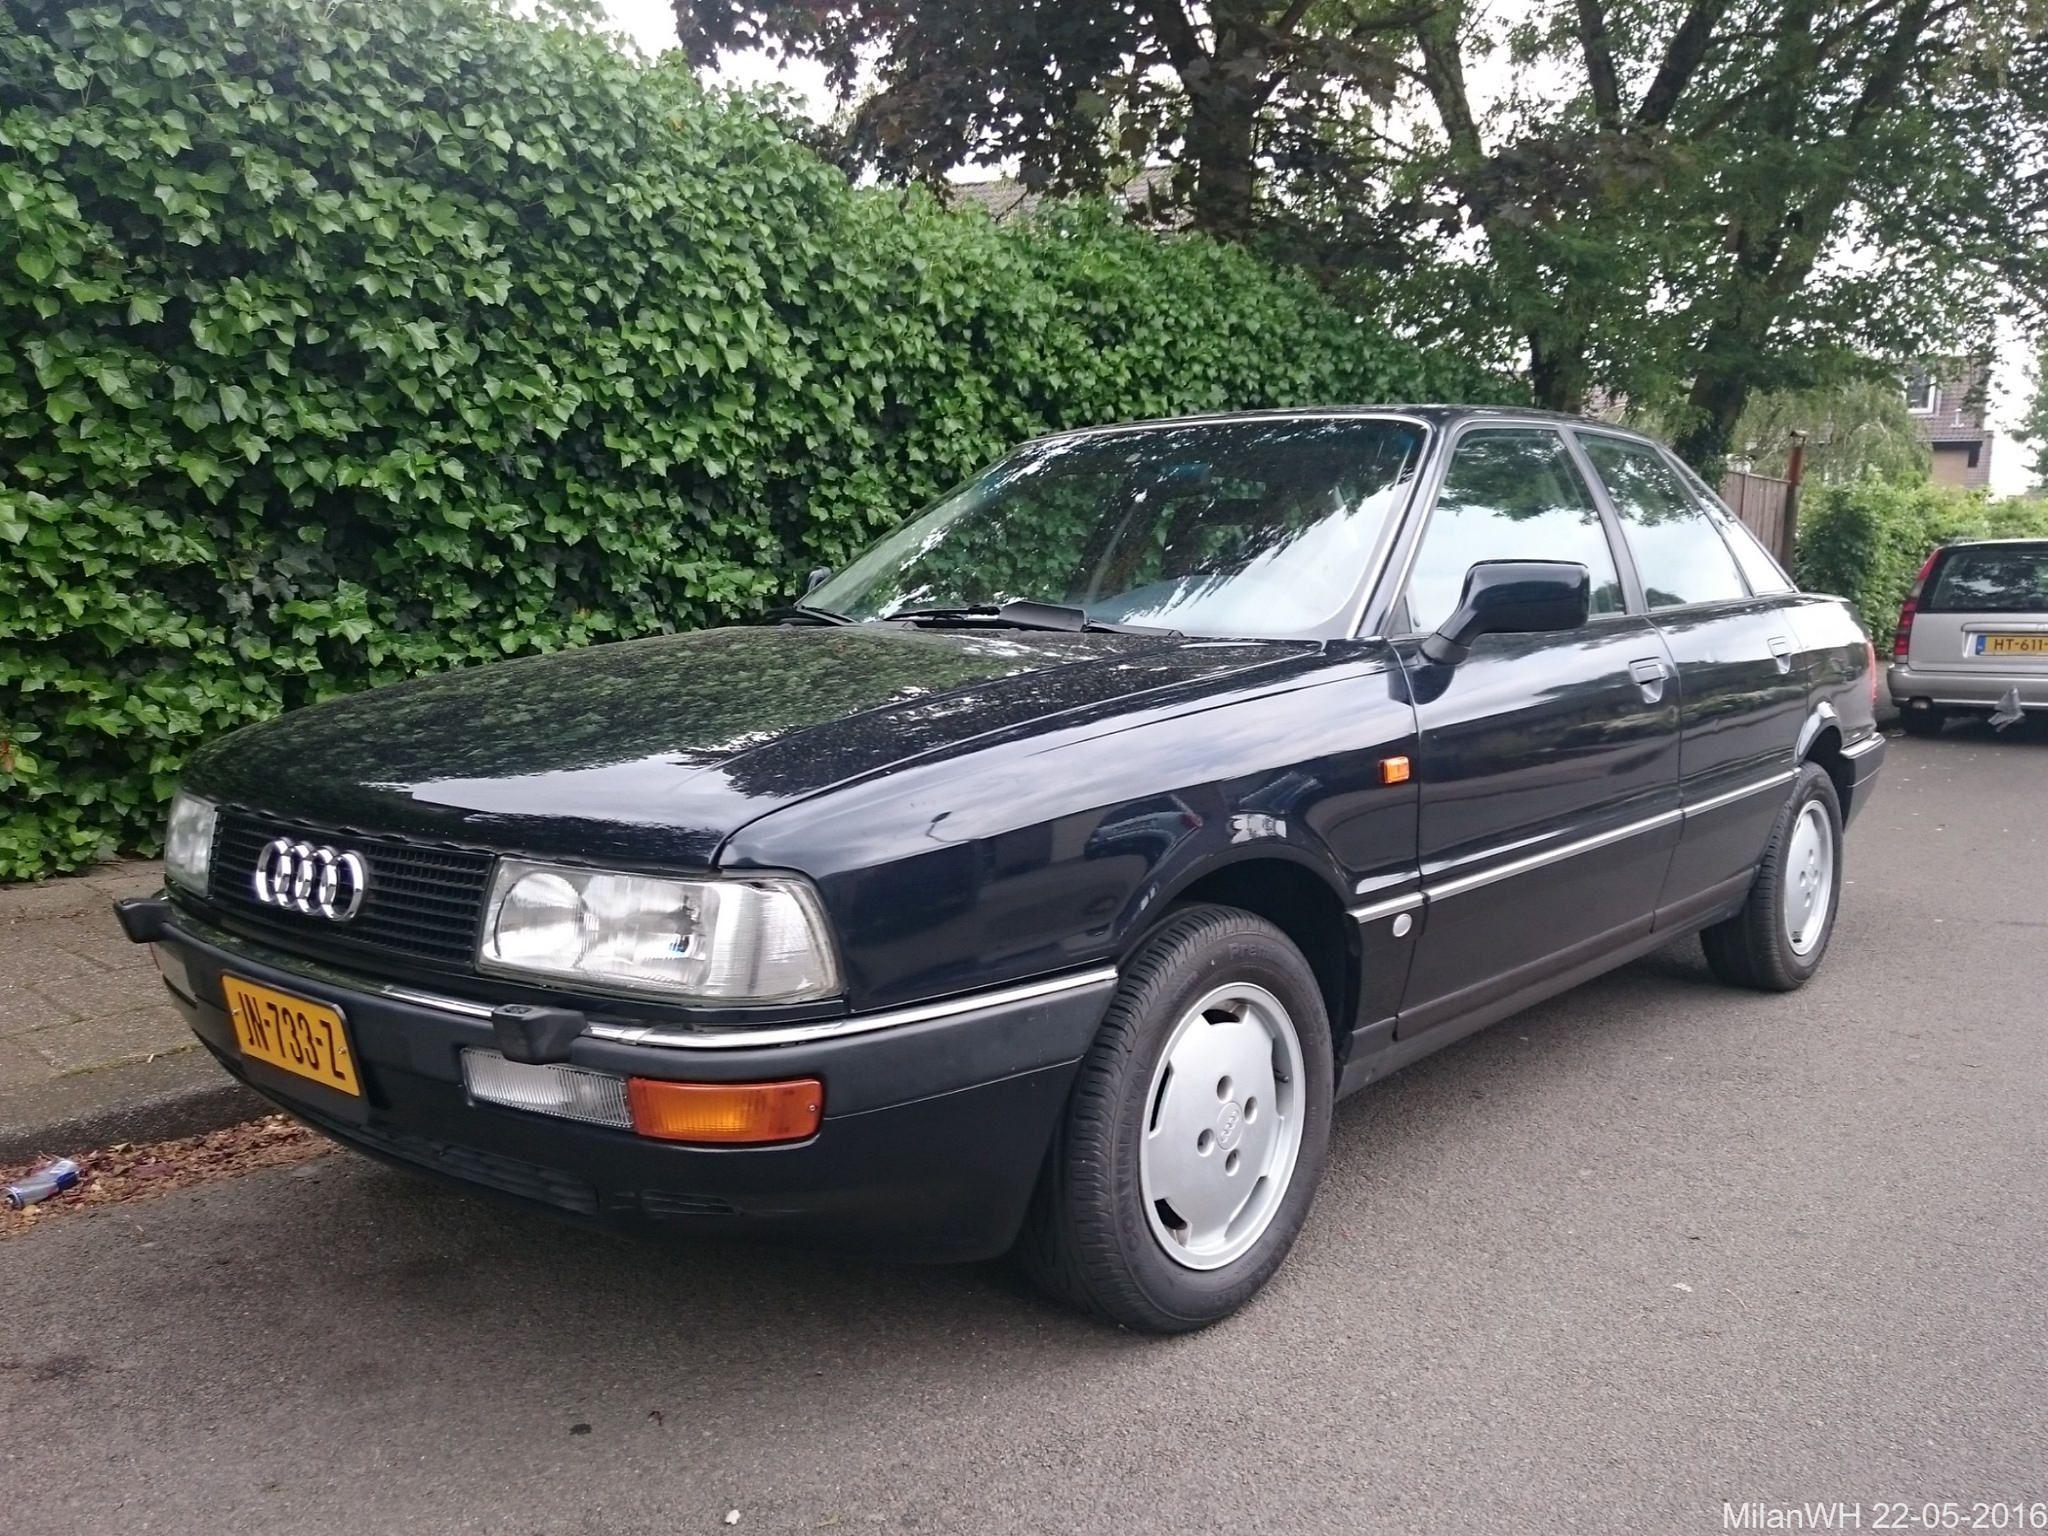 Audi 90 2 3e 1991 Jn 733 Z Audi Classic Cars Suv